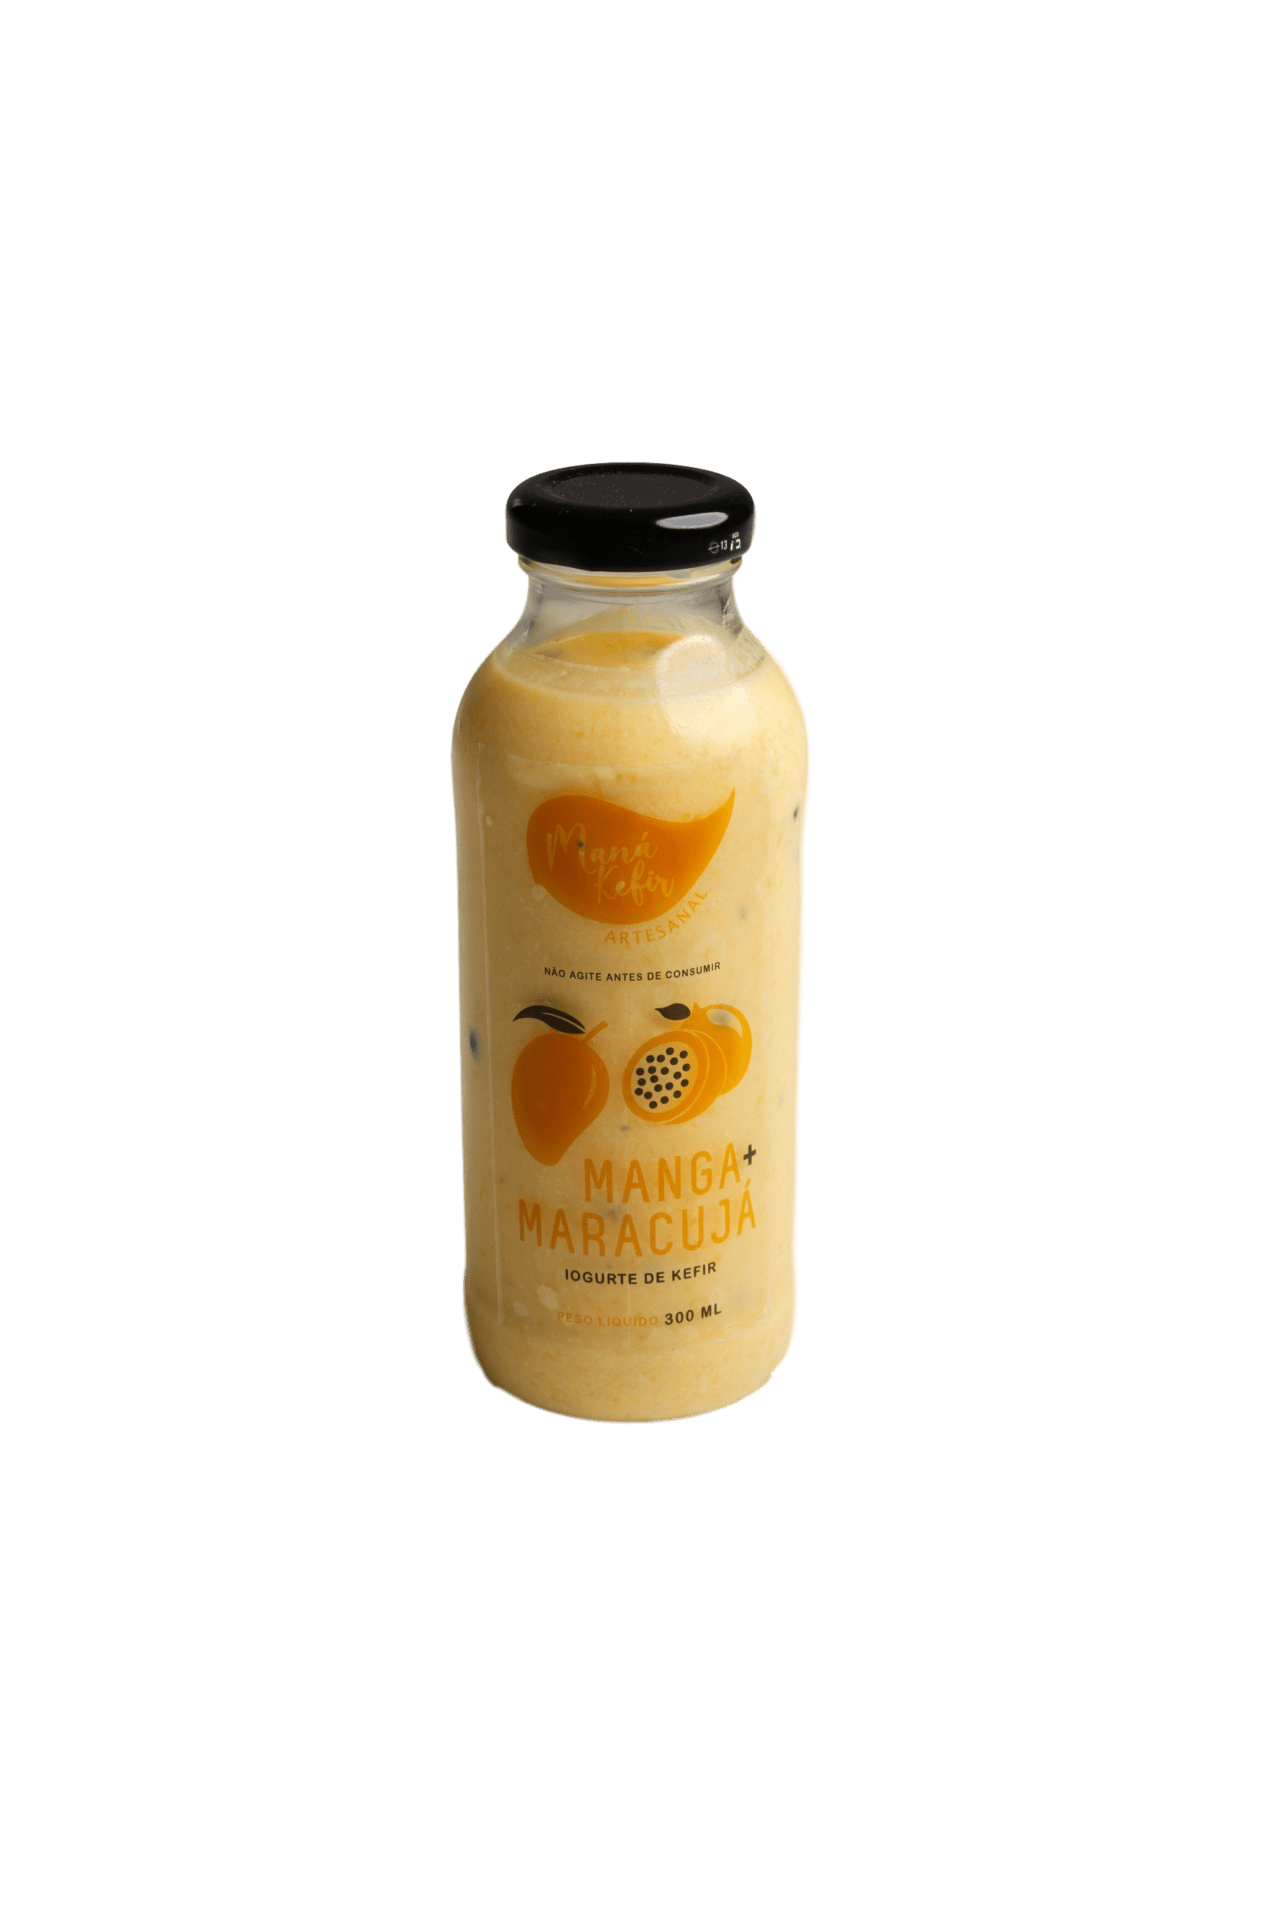 Iogurte De Kefir Manga E Maracuja 300ml - Mana Kefir